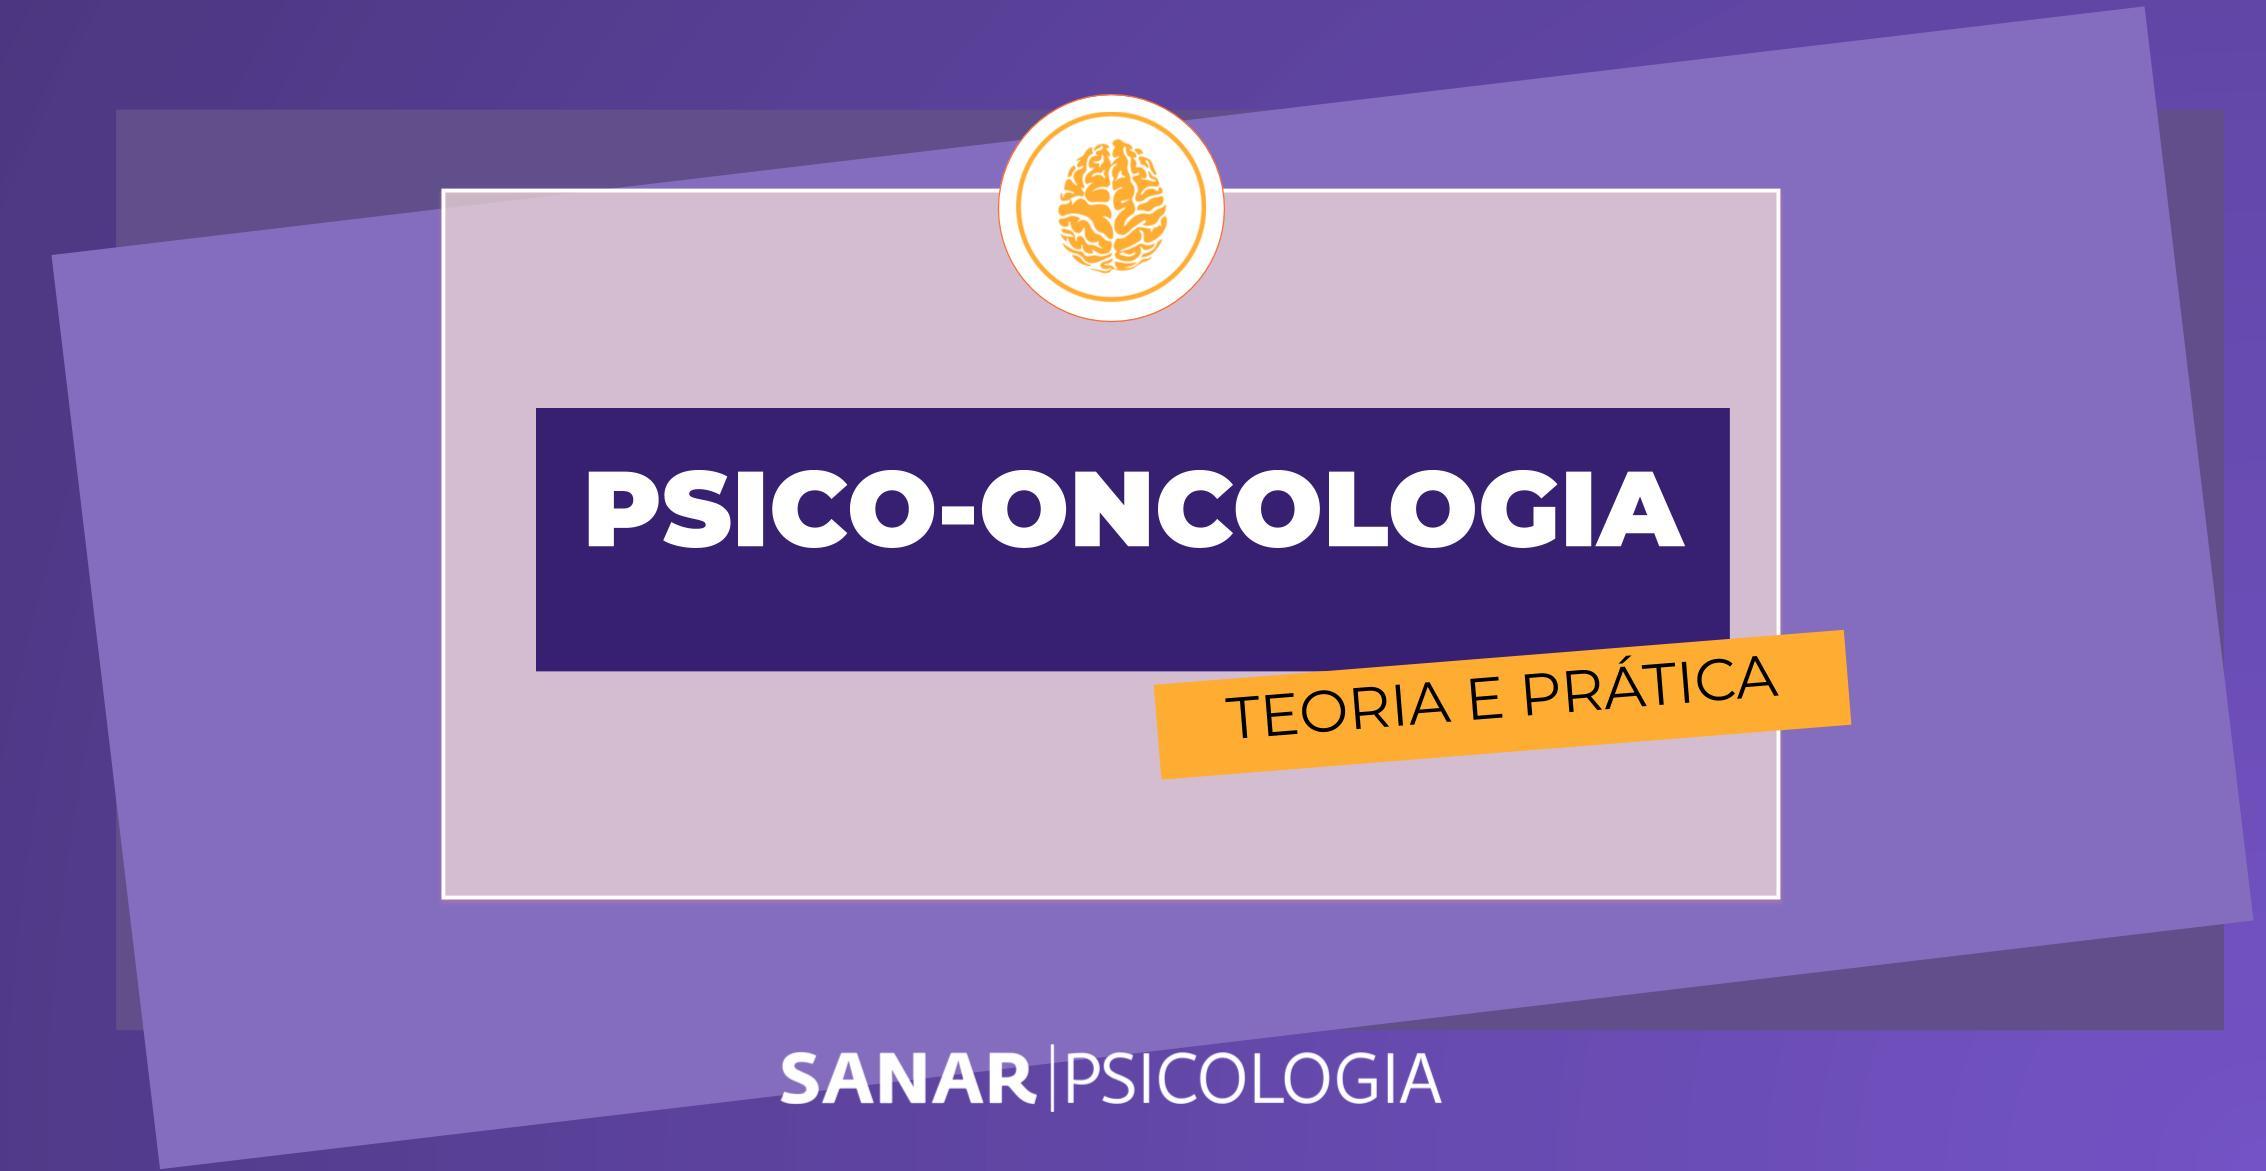 Psico-Oncologia: Teoria e Prática